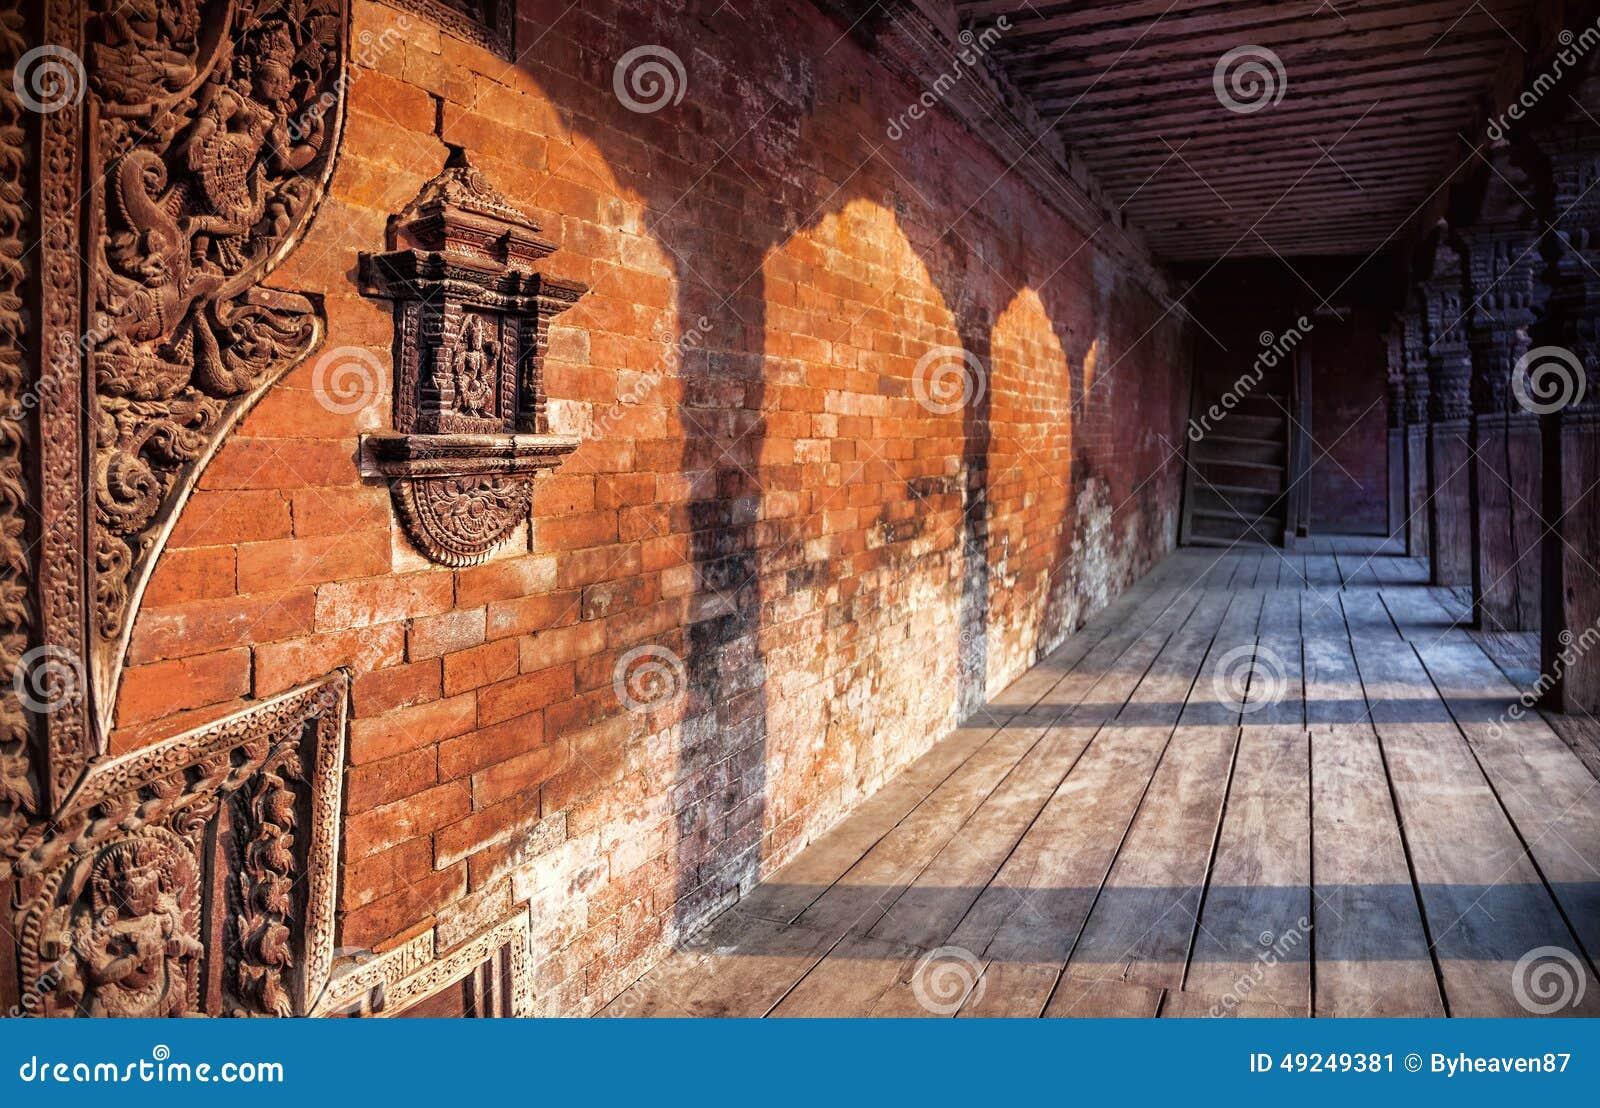 Nepali Architecture In Bhaktapur Stock Photo Image 49249381